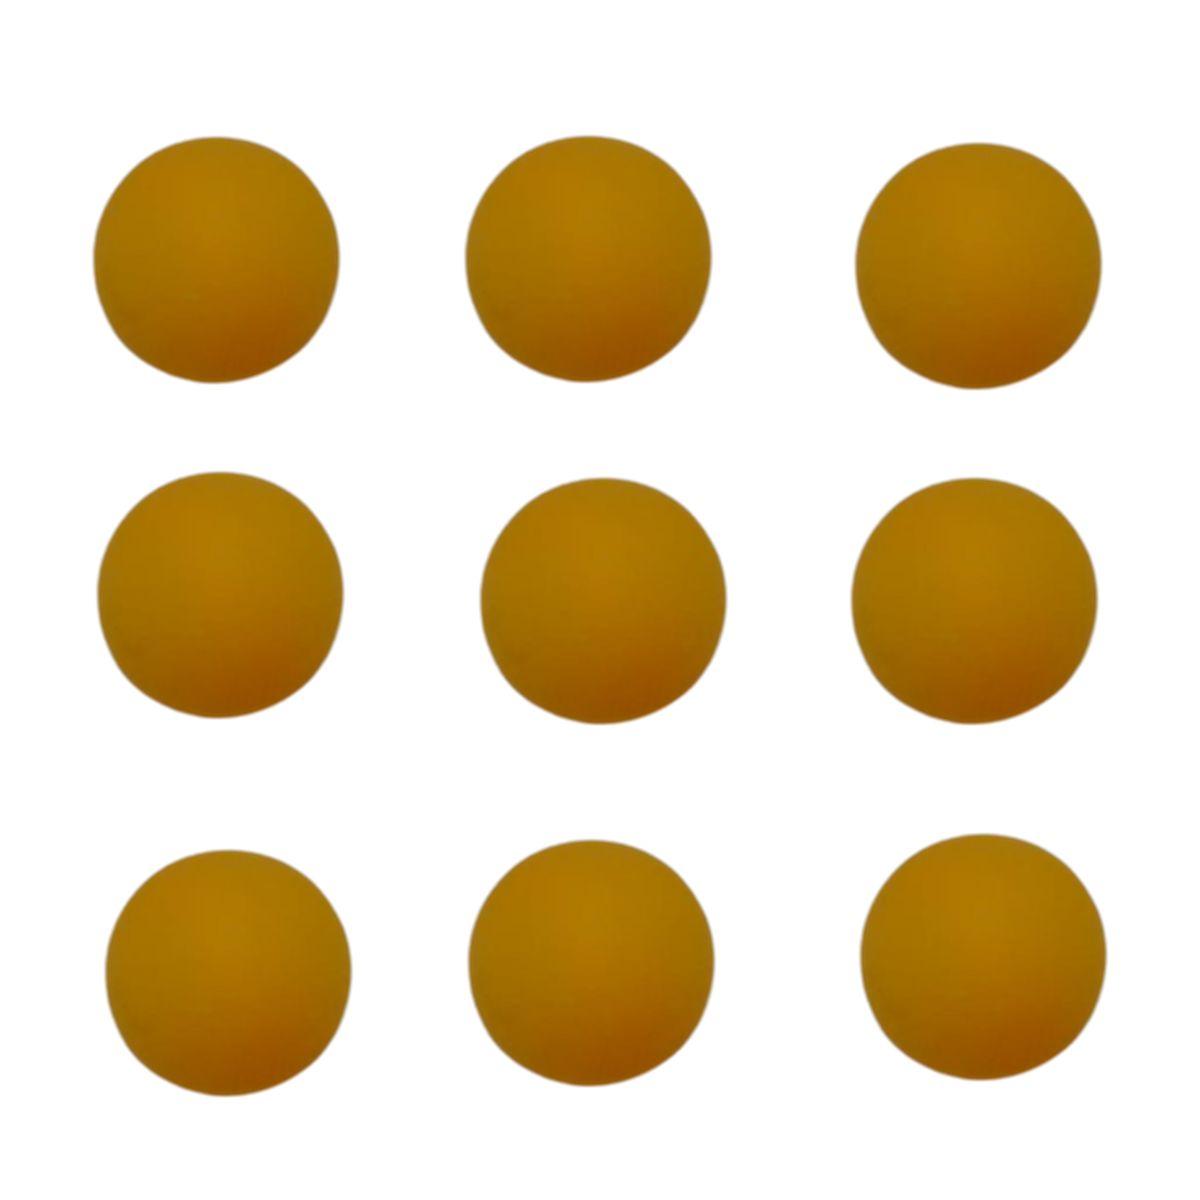 Bola Tênis de Mesa Ping Pong Pentagol 38mm